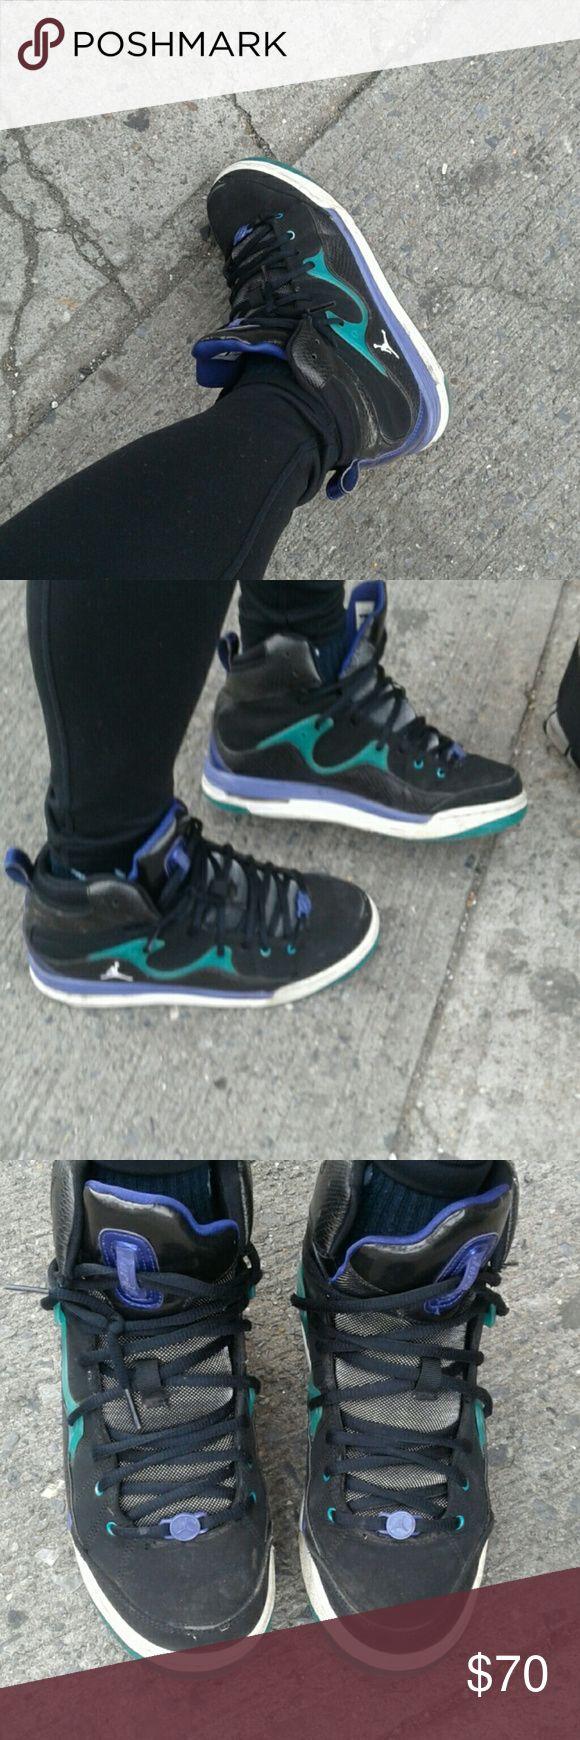 jordans black, purple and green jordans 2014 Jordan Shoes Sneakers